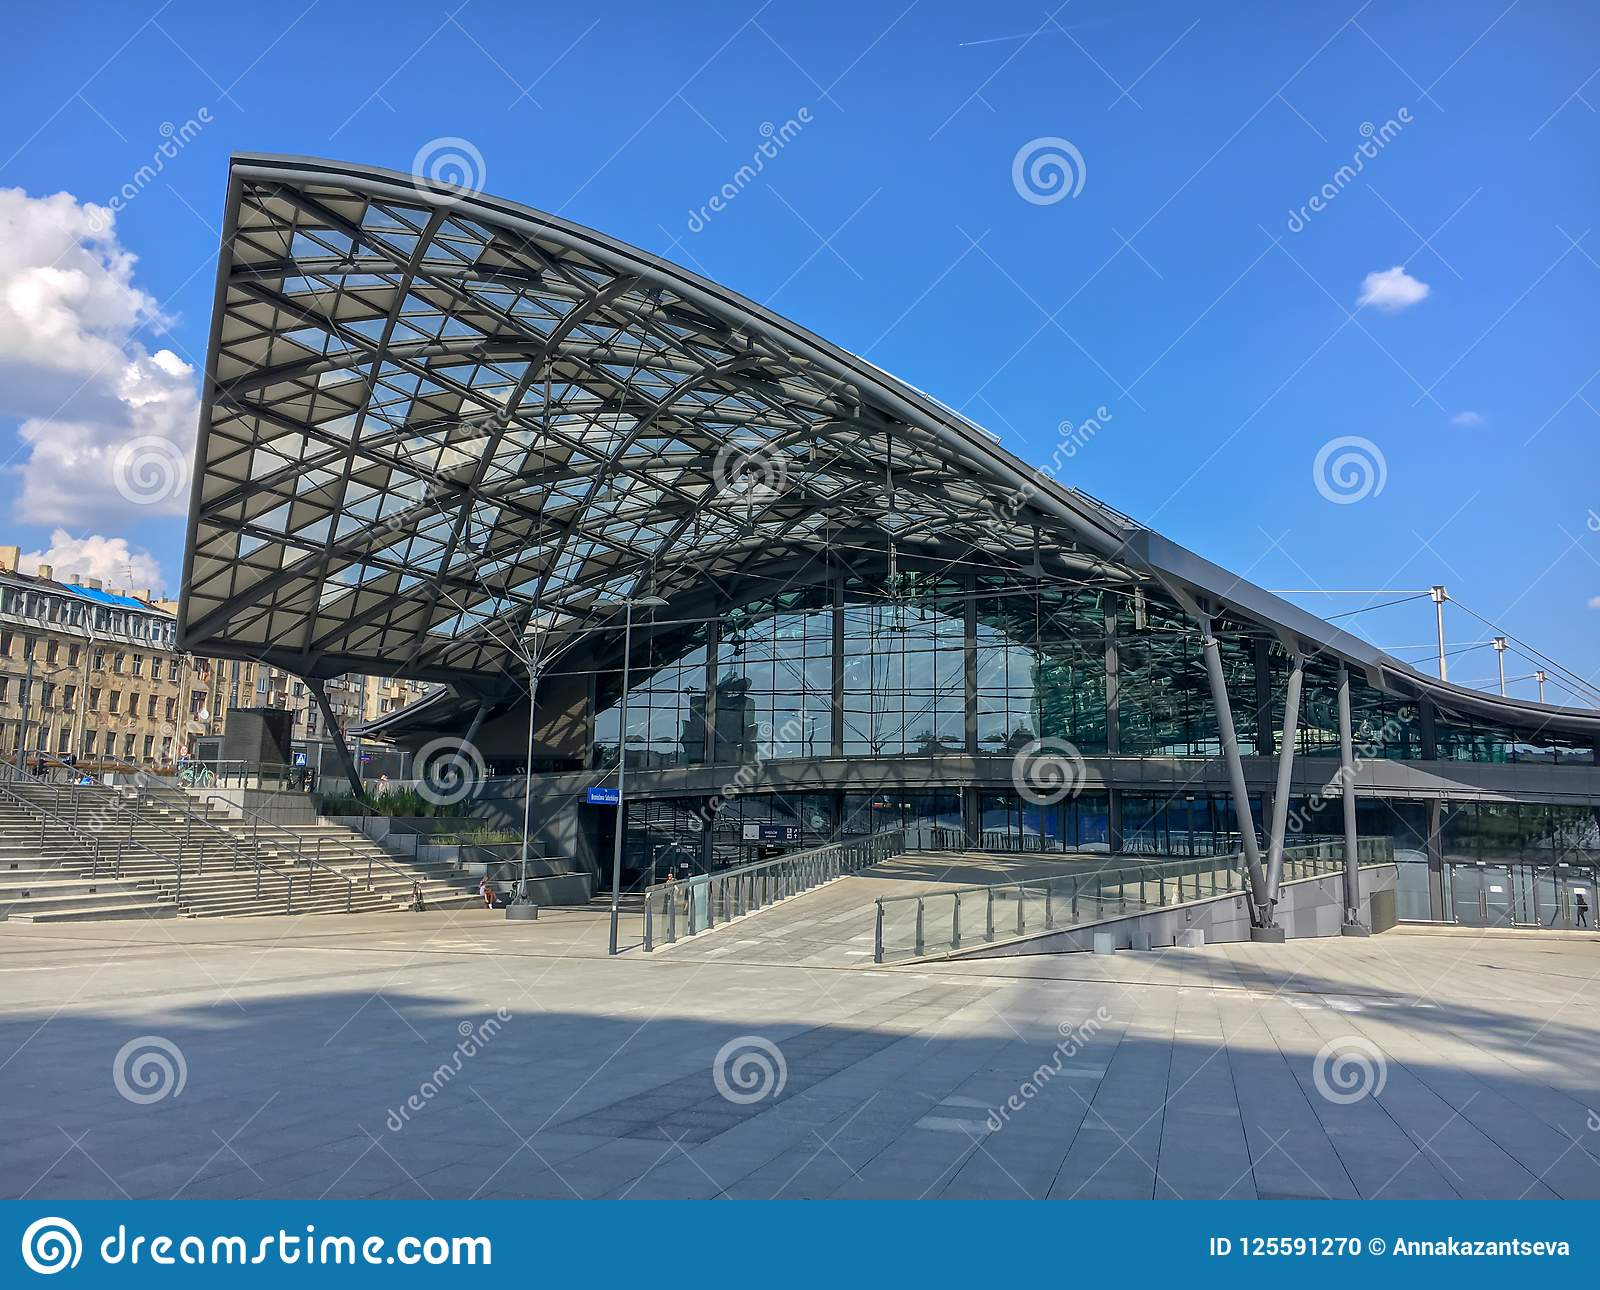 ` de Lodz Fabryczna de ` de gare ferroviaire, Lodz, Pologne Belle gare ferroviaire moderne et futuriste